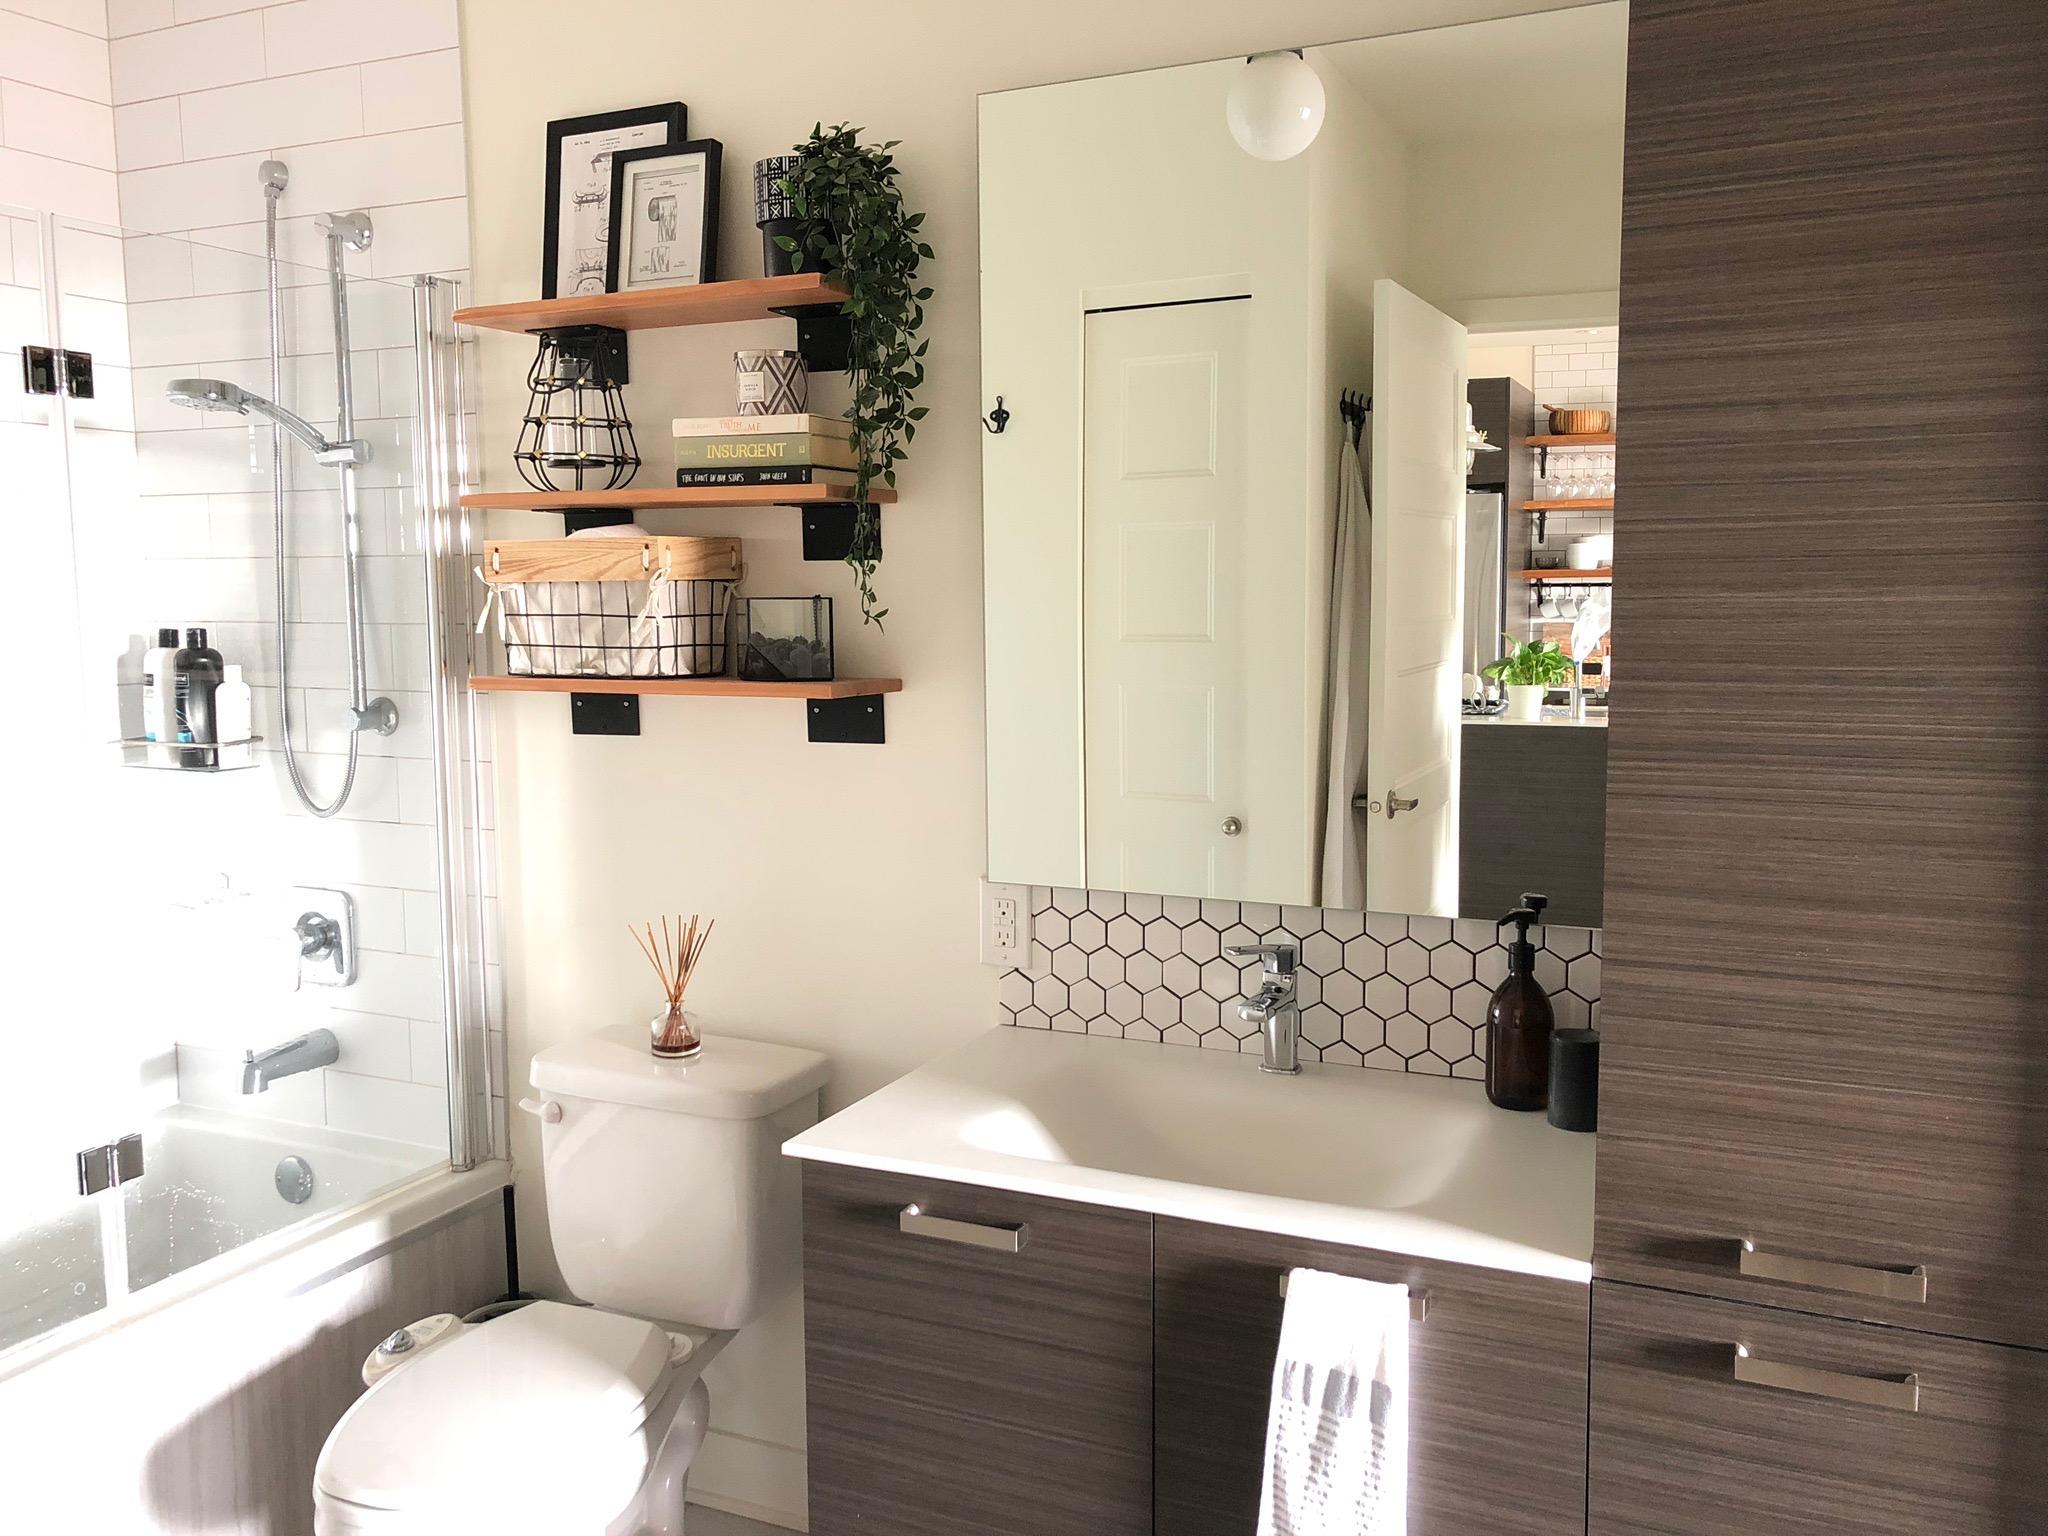 10 Rustic Bathroom Decor Ideas You'll Love - Small Space ... on Restroom Ideas  id=26977